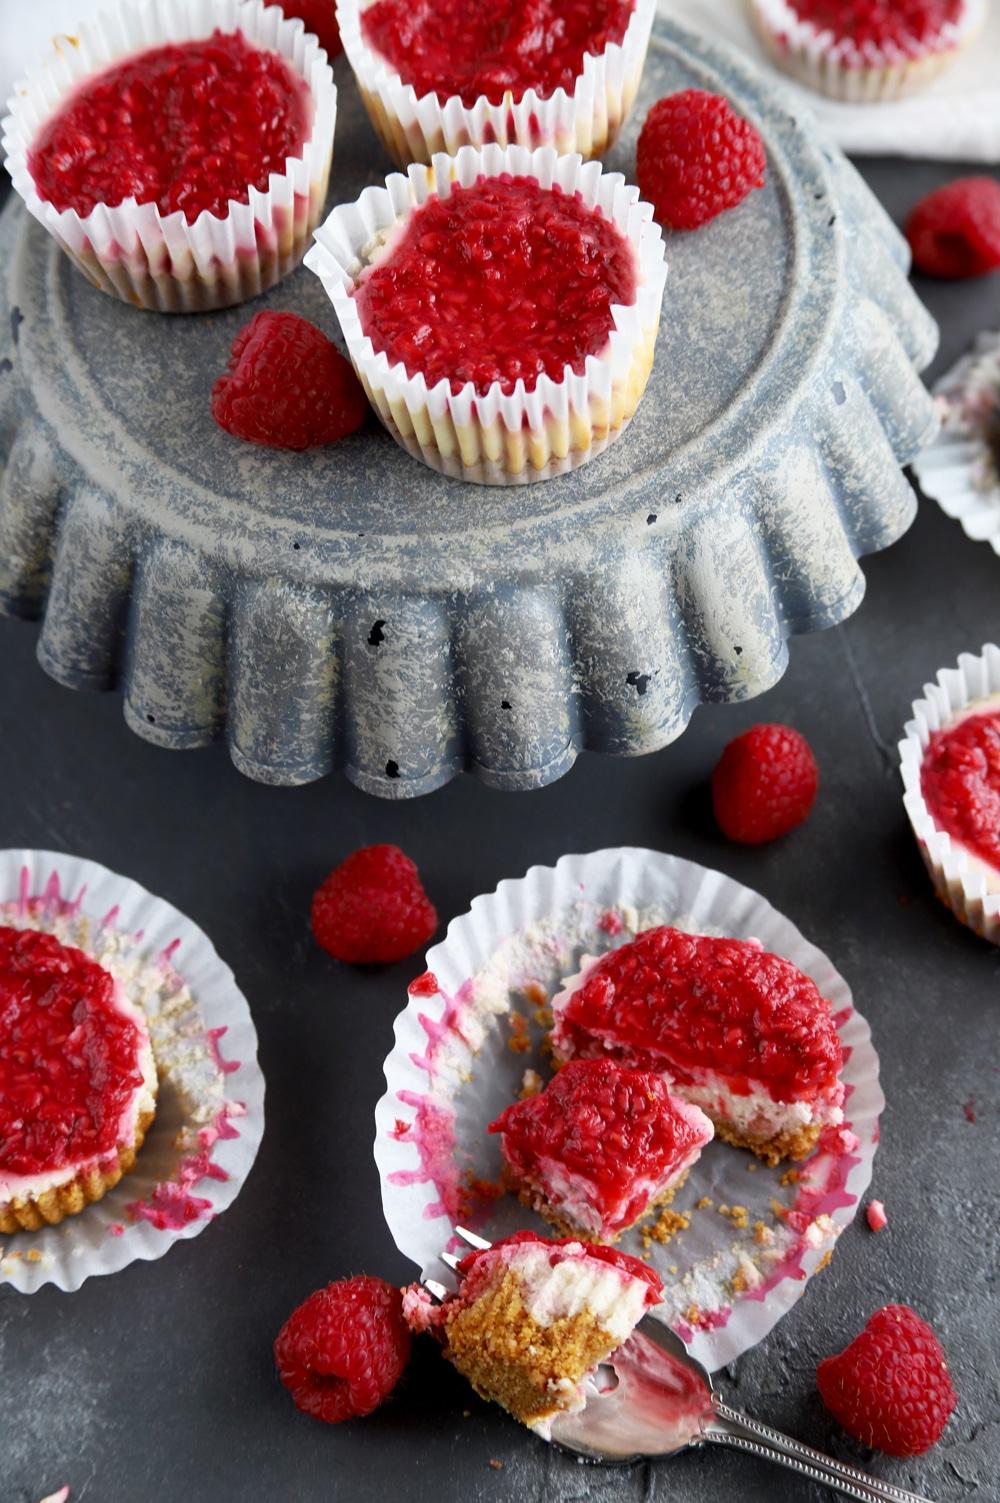 Lemon Raspberry Cheesecake Recipe